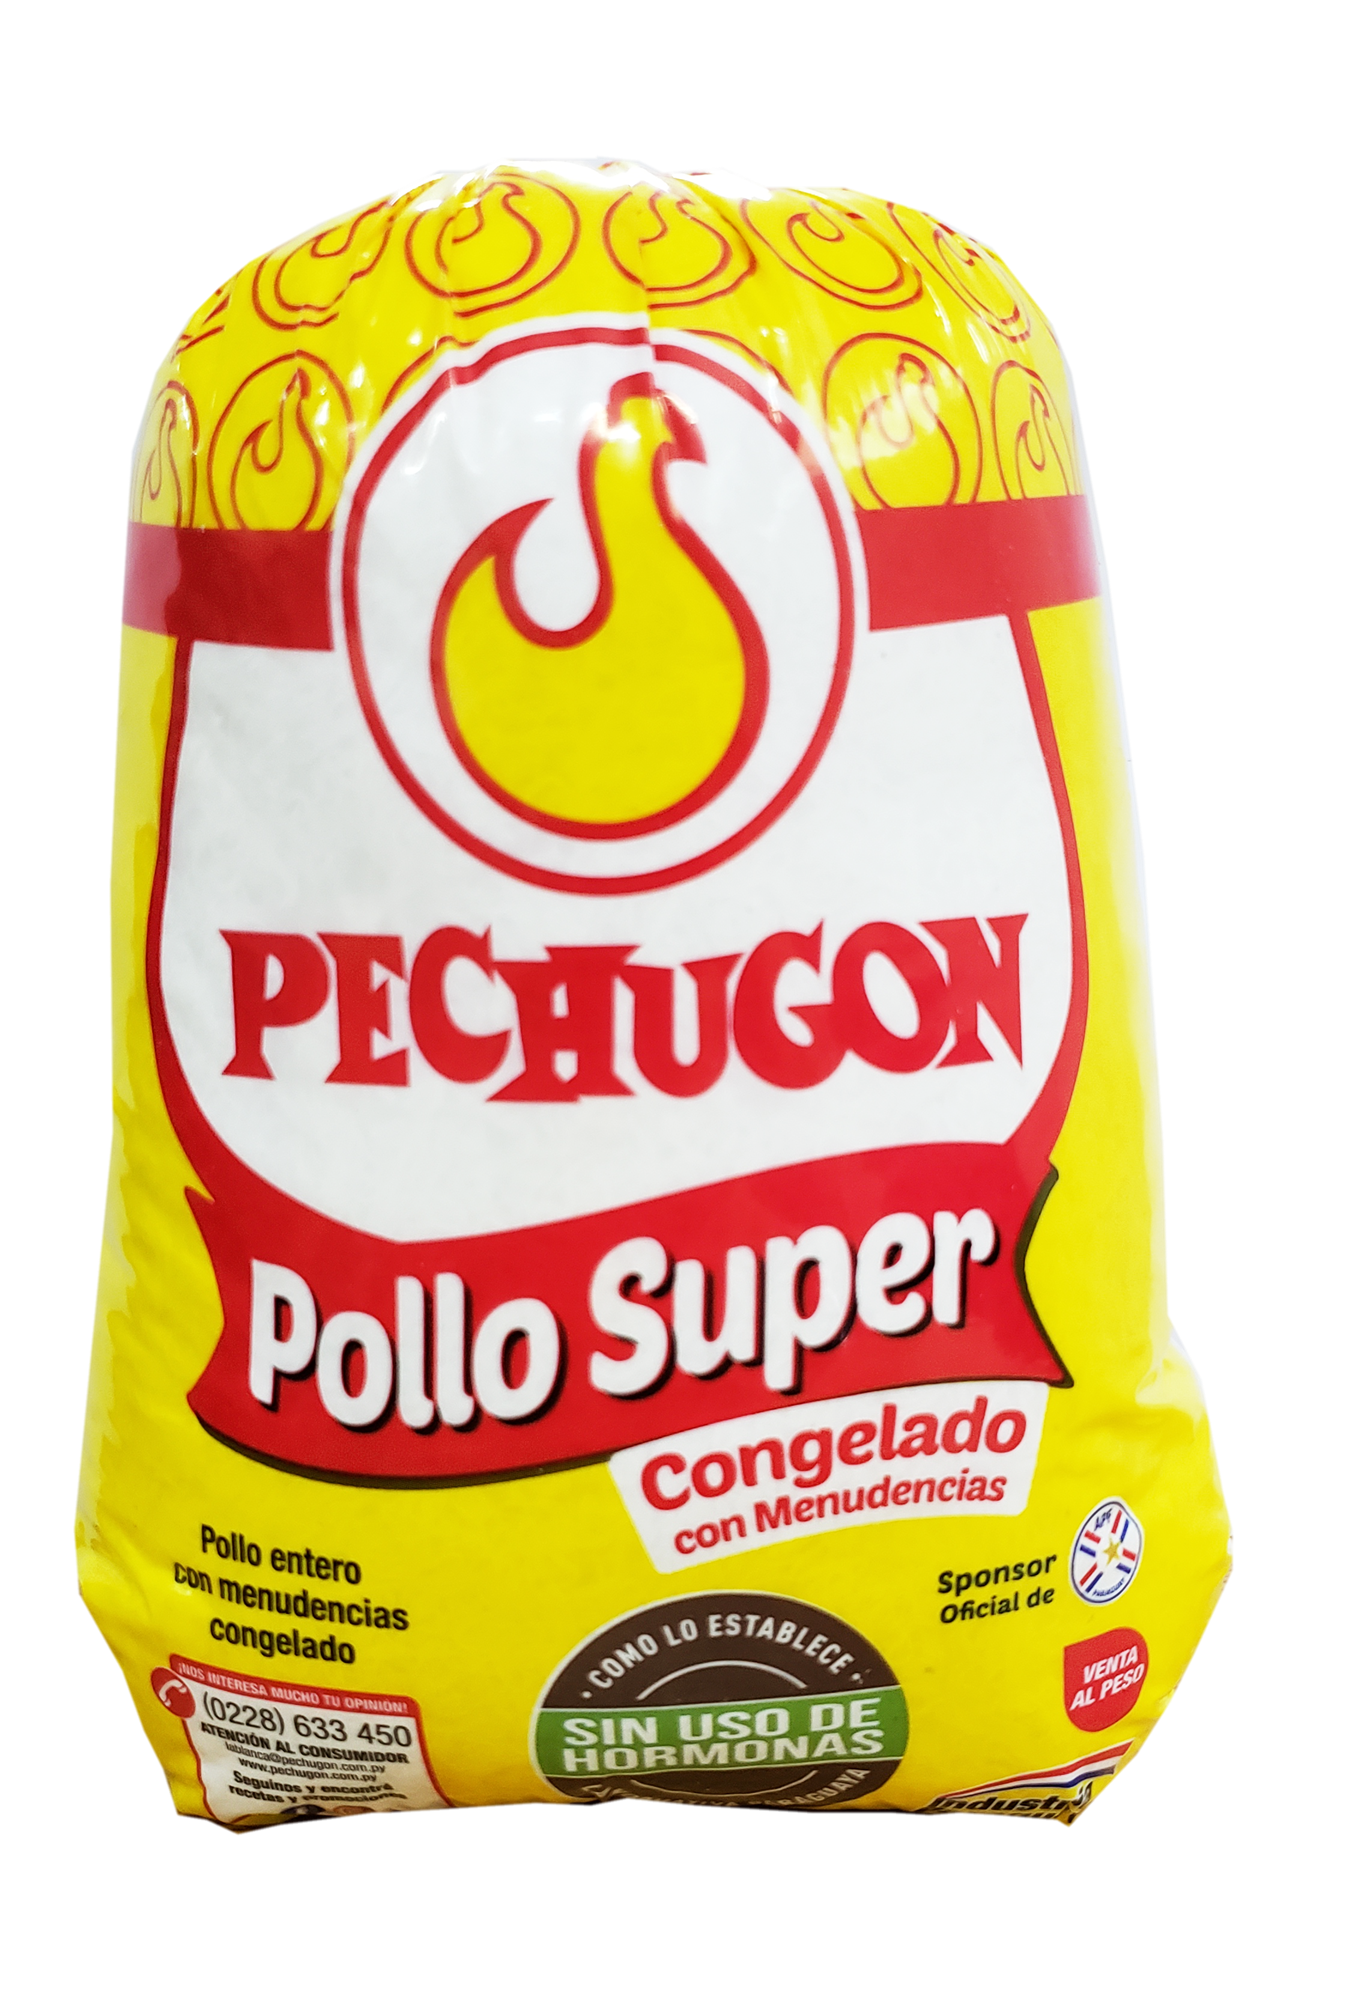 POLLO CONGELADO PECHUGON SUPER POR KILO